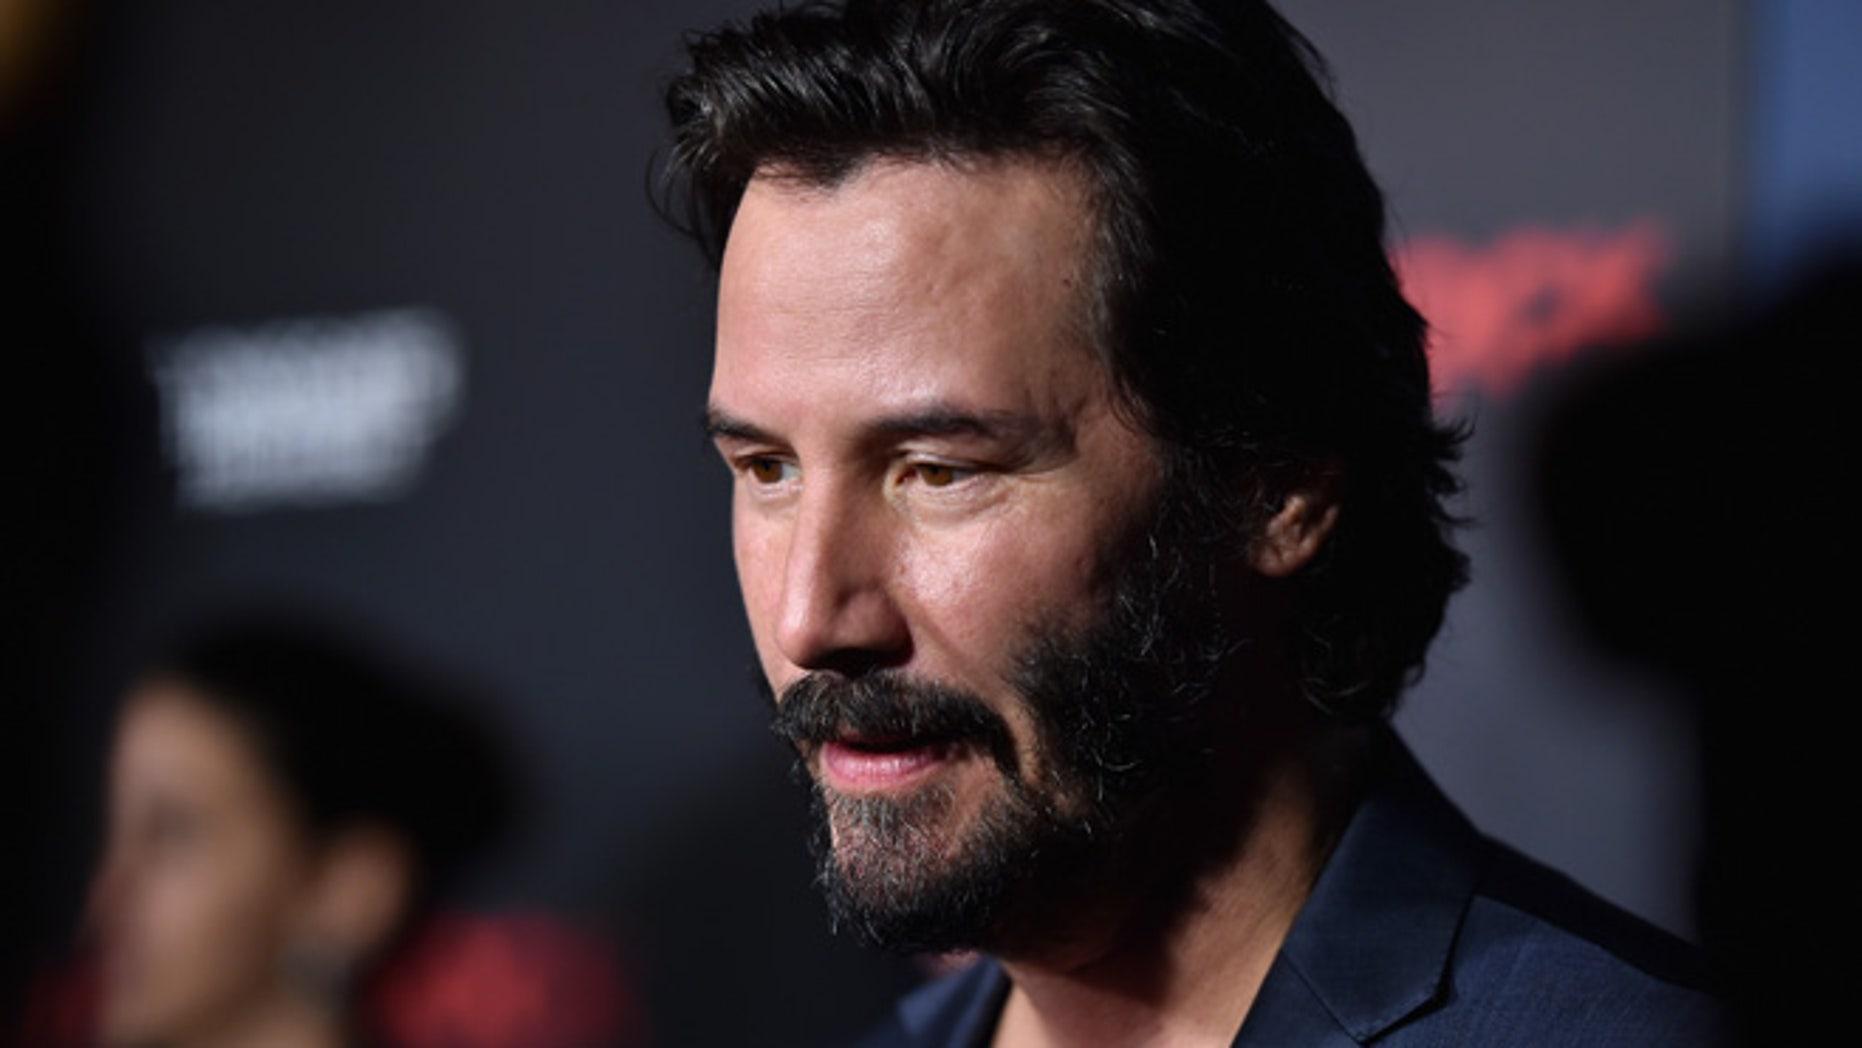 Keanu Reeves on October 7, 2015 in Hollywood, California.